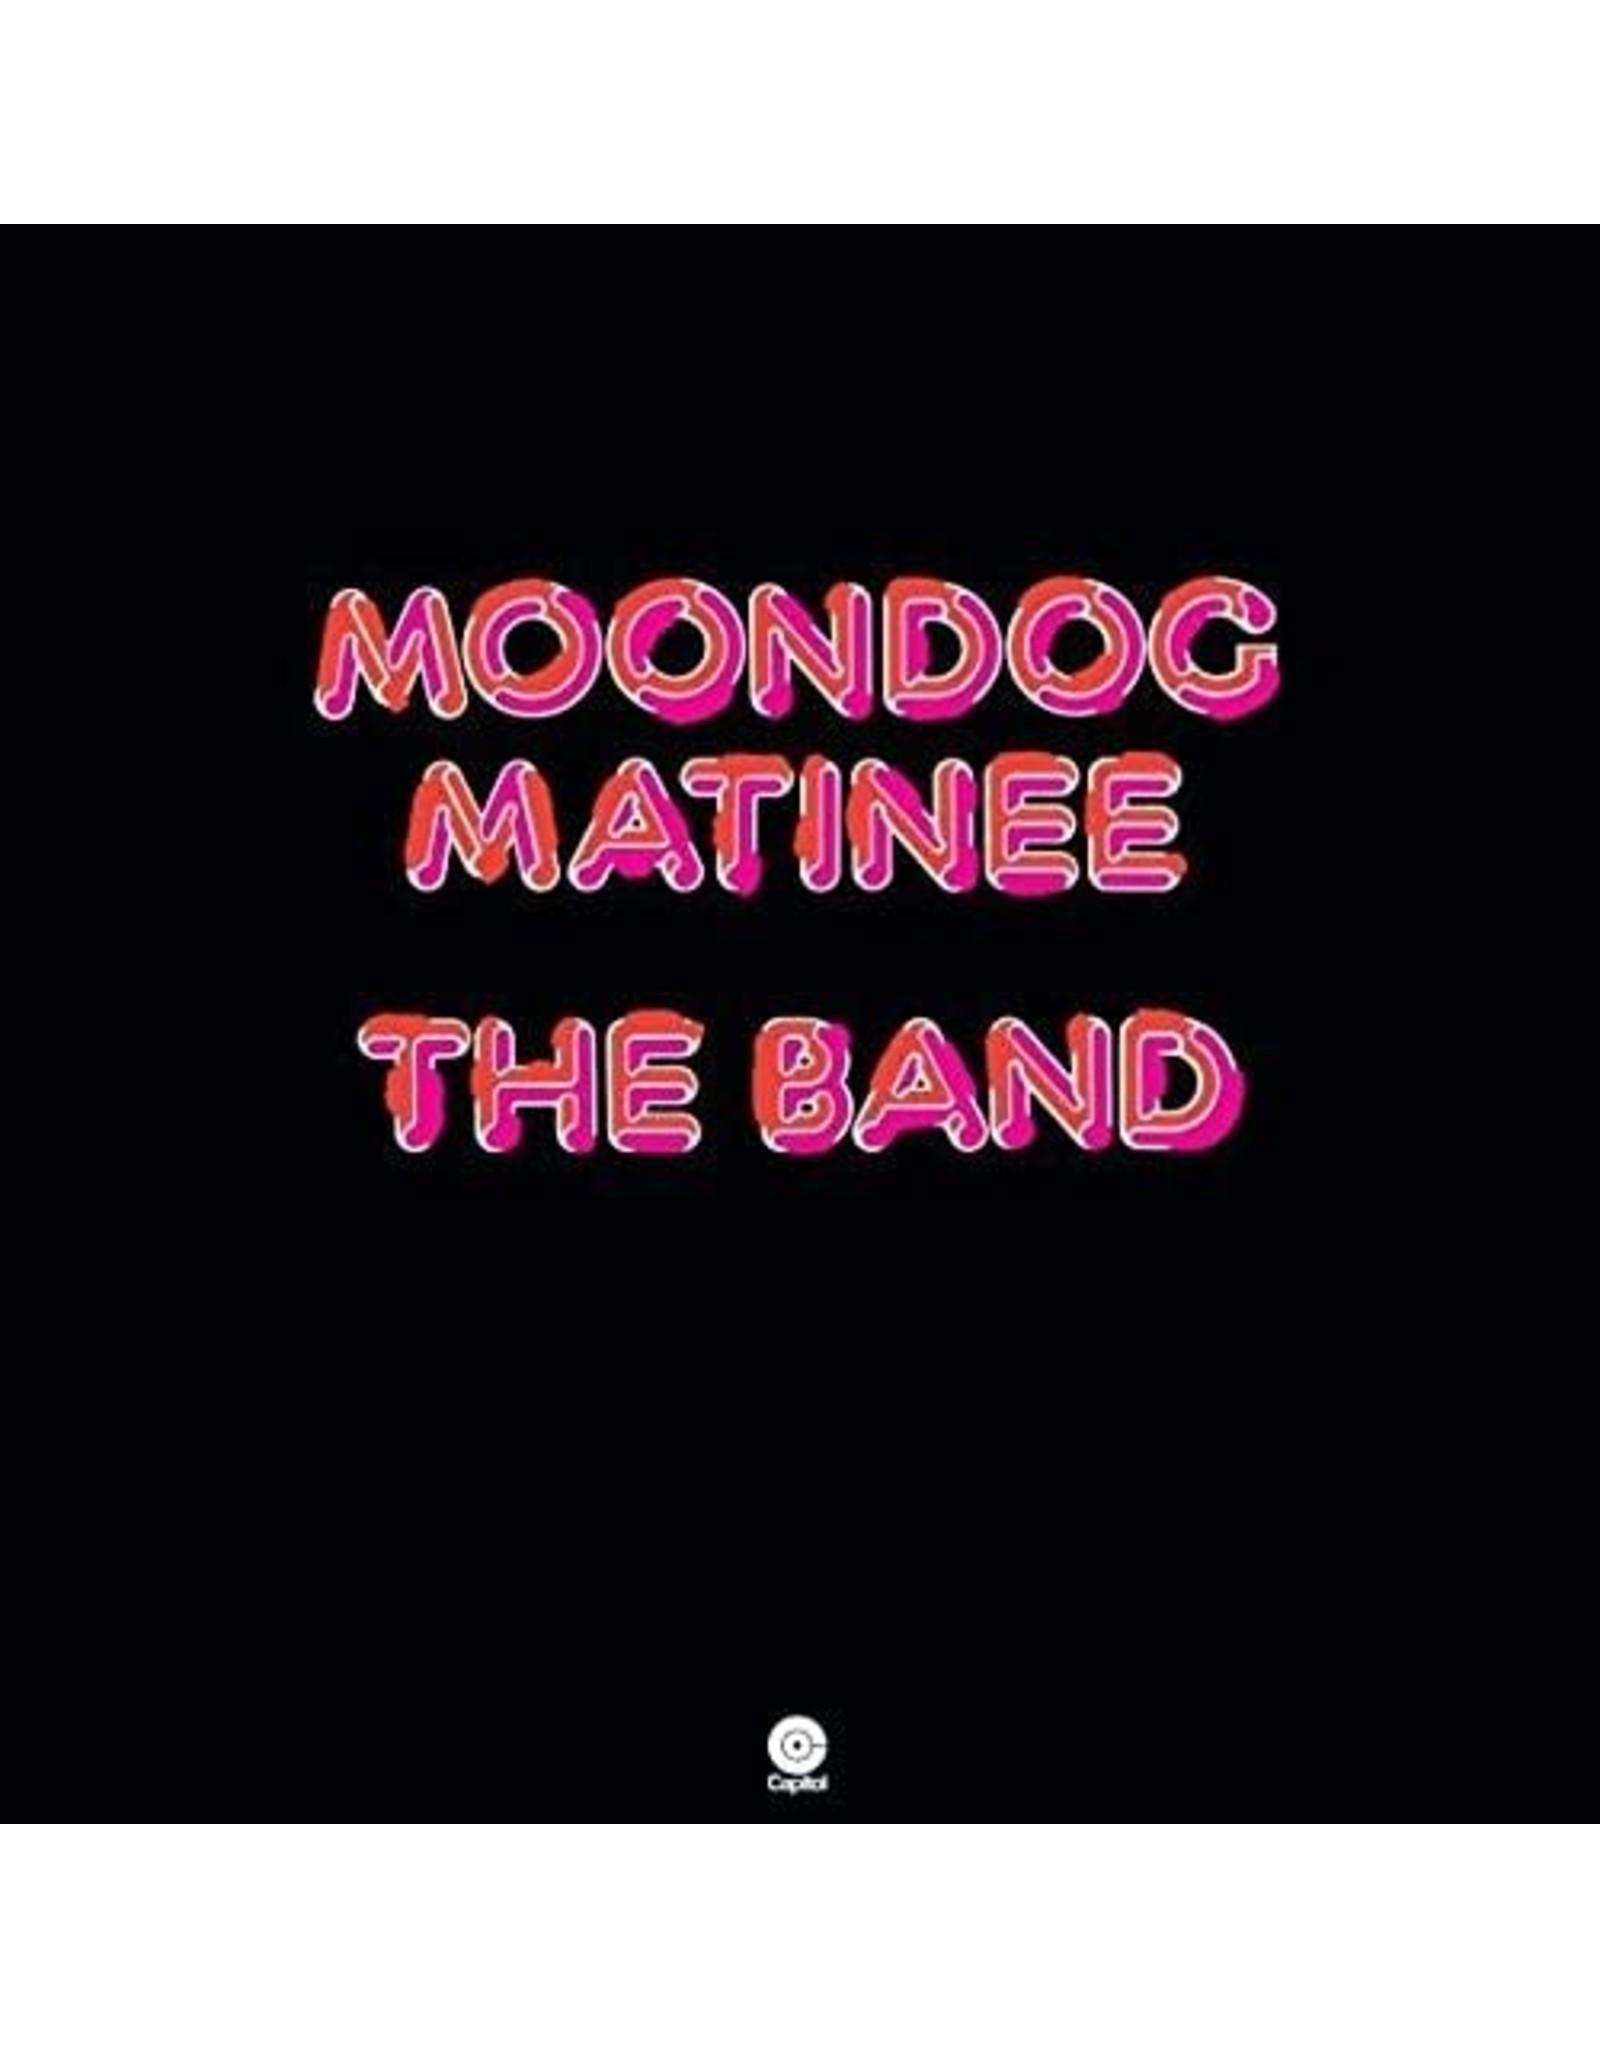 The Band - Moondog Matinee